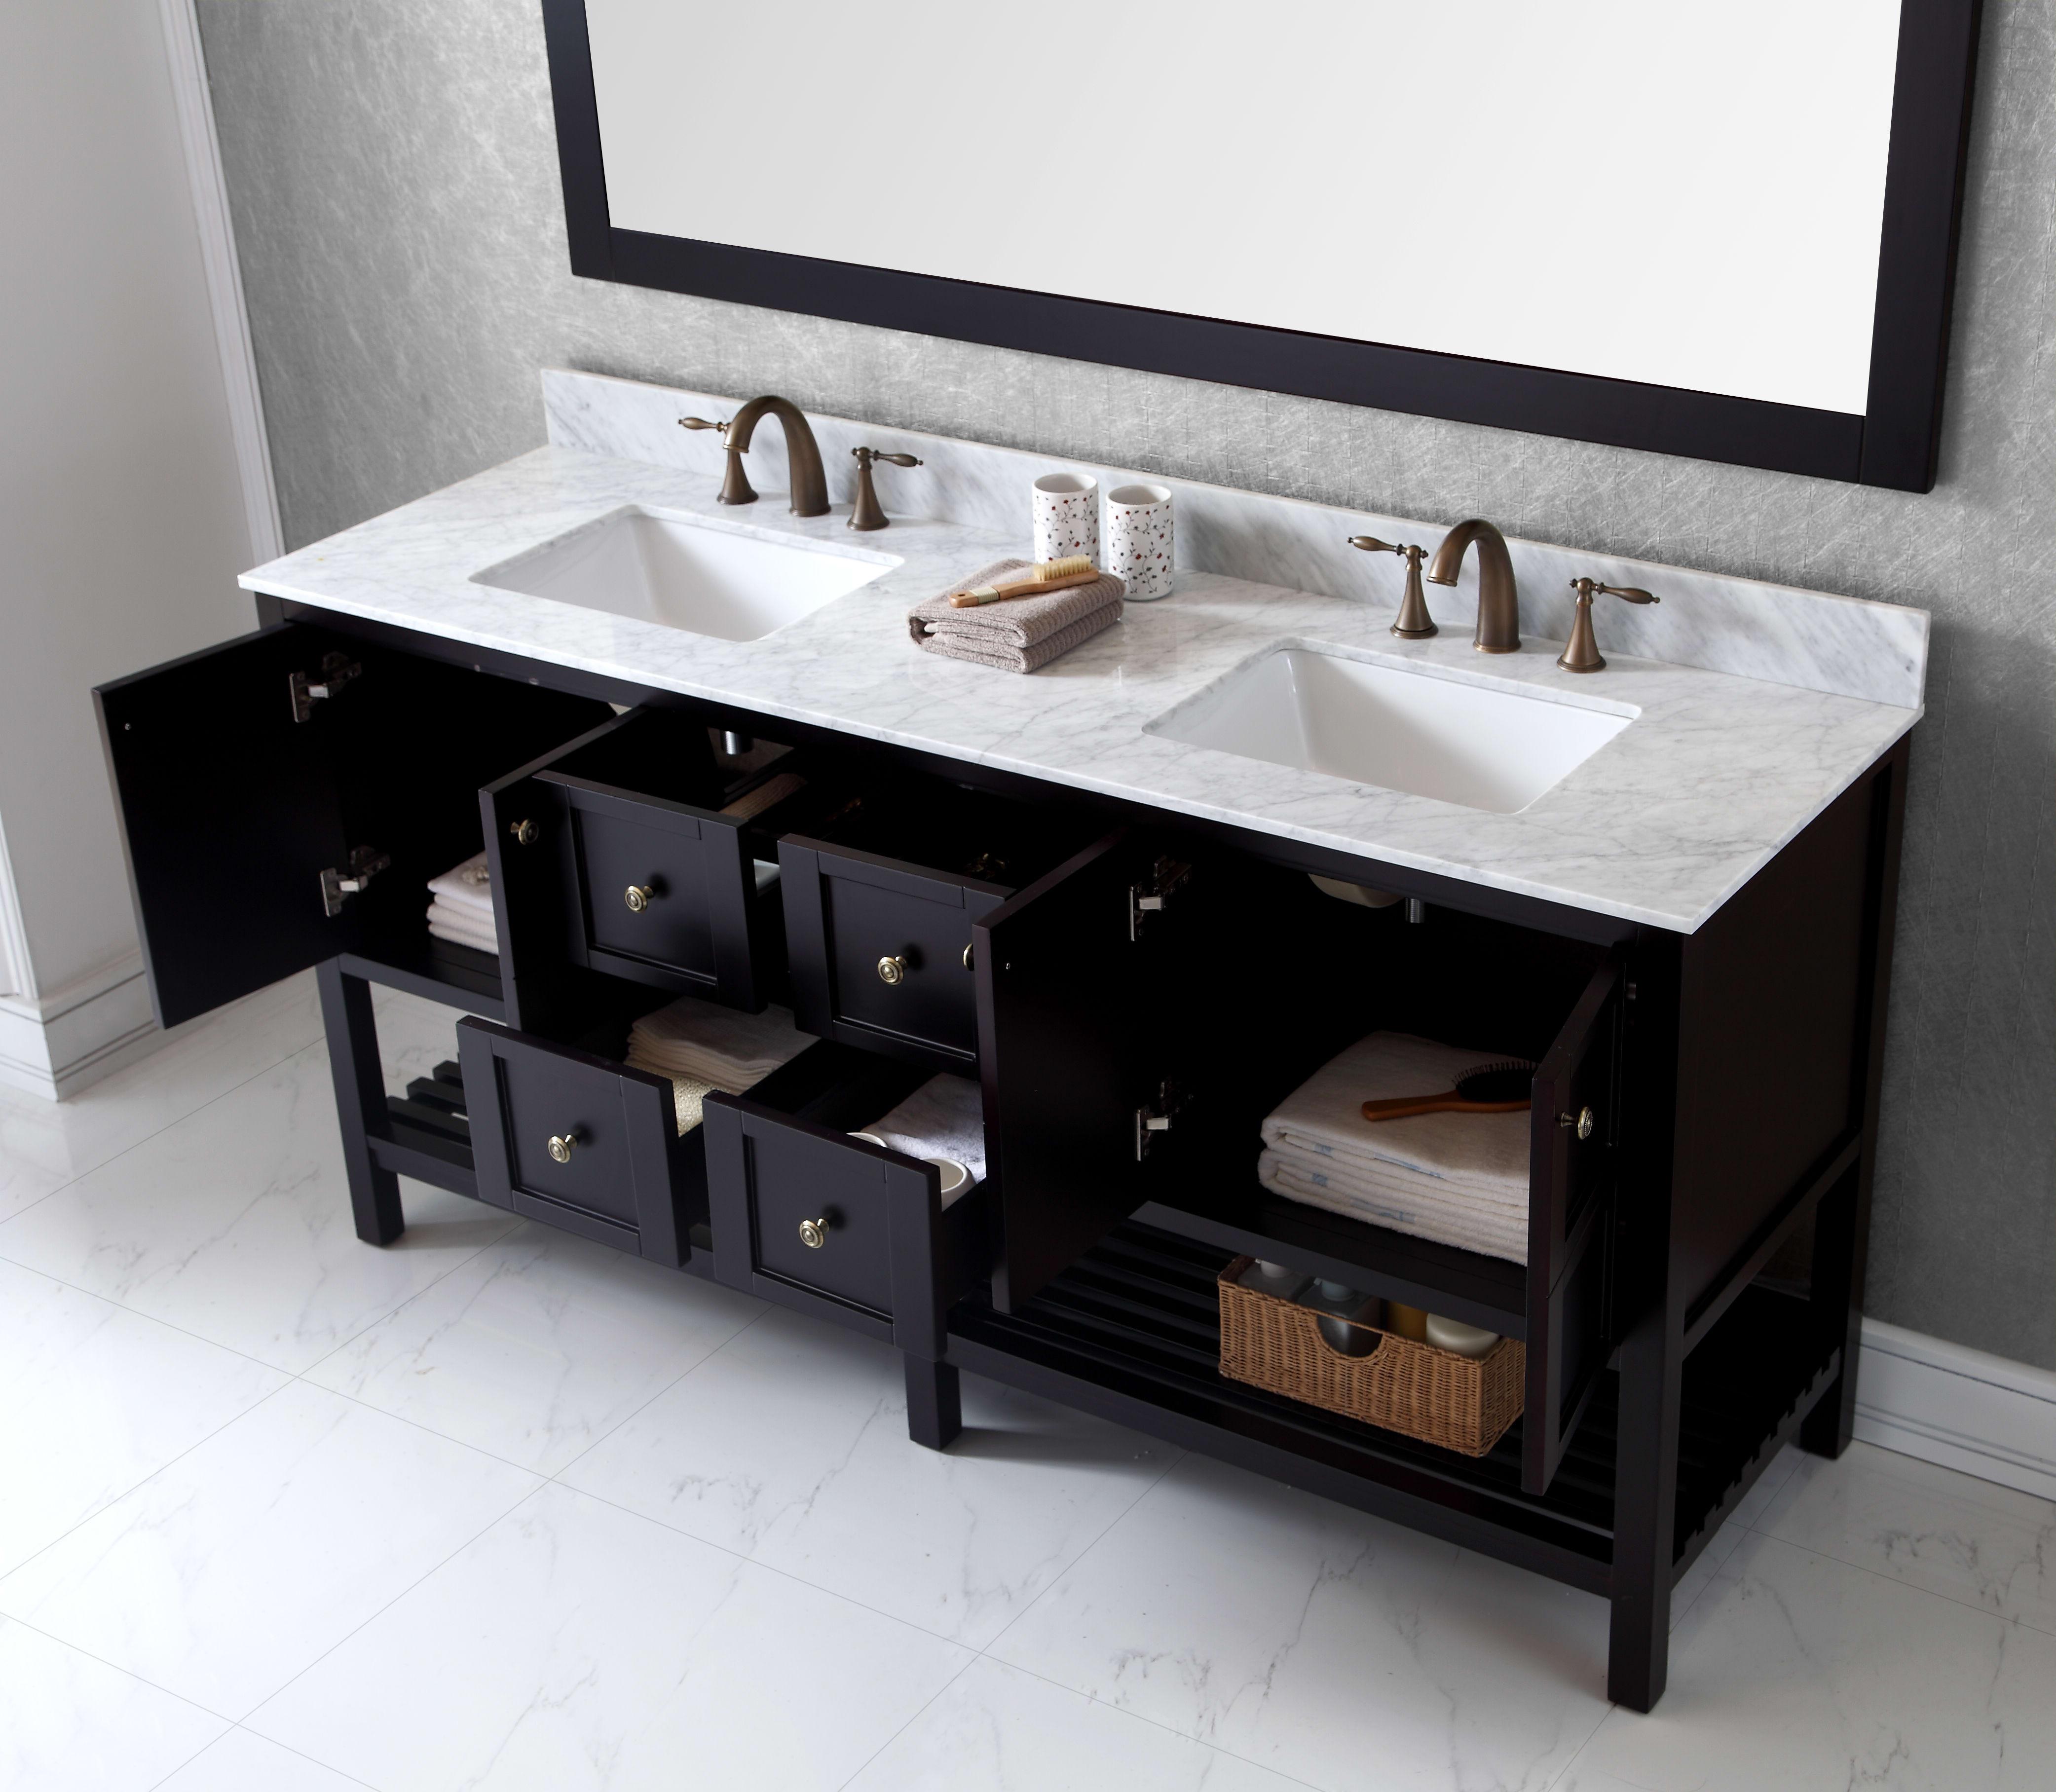 Virtu Usa Ed 30072 Wmsq Es Espresso Rectangular Sink Winterfell 72 Free Standing Vanity Set With Oak Cabinet Marble Top 2 Undermount Sinks And 1 Mirror